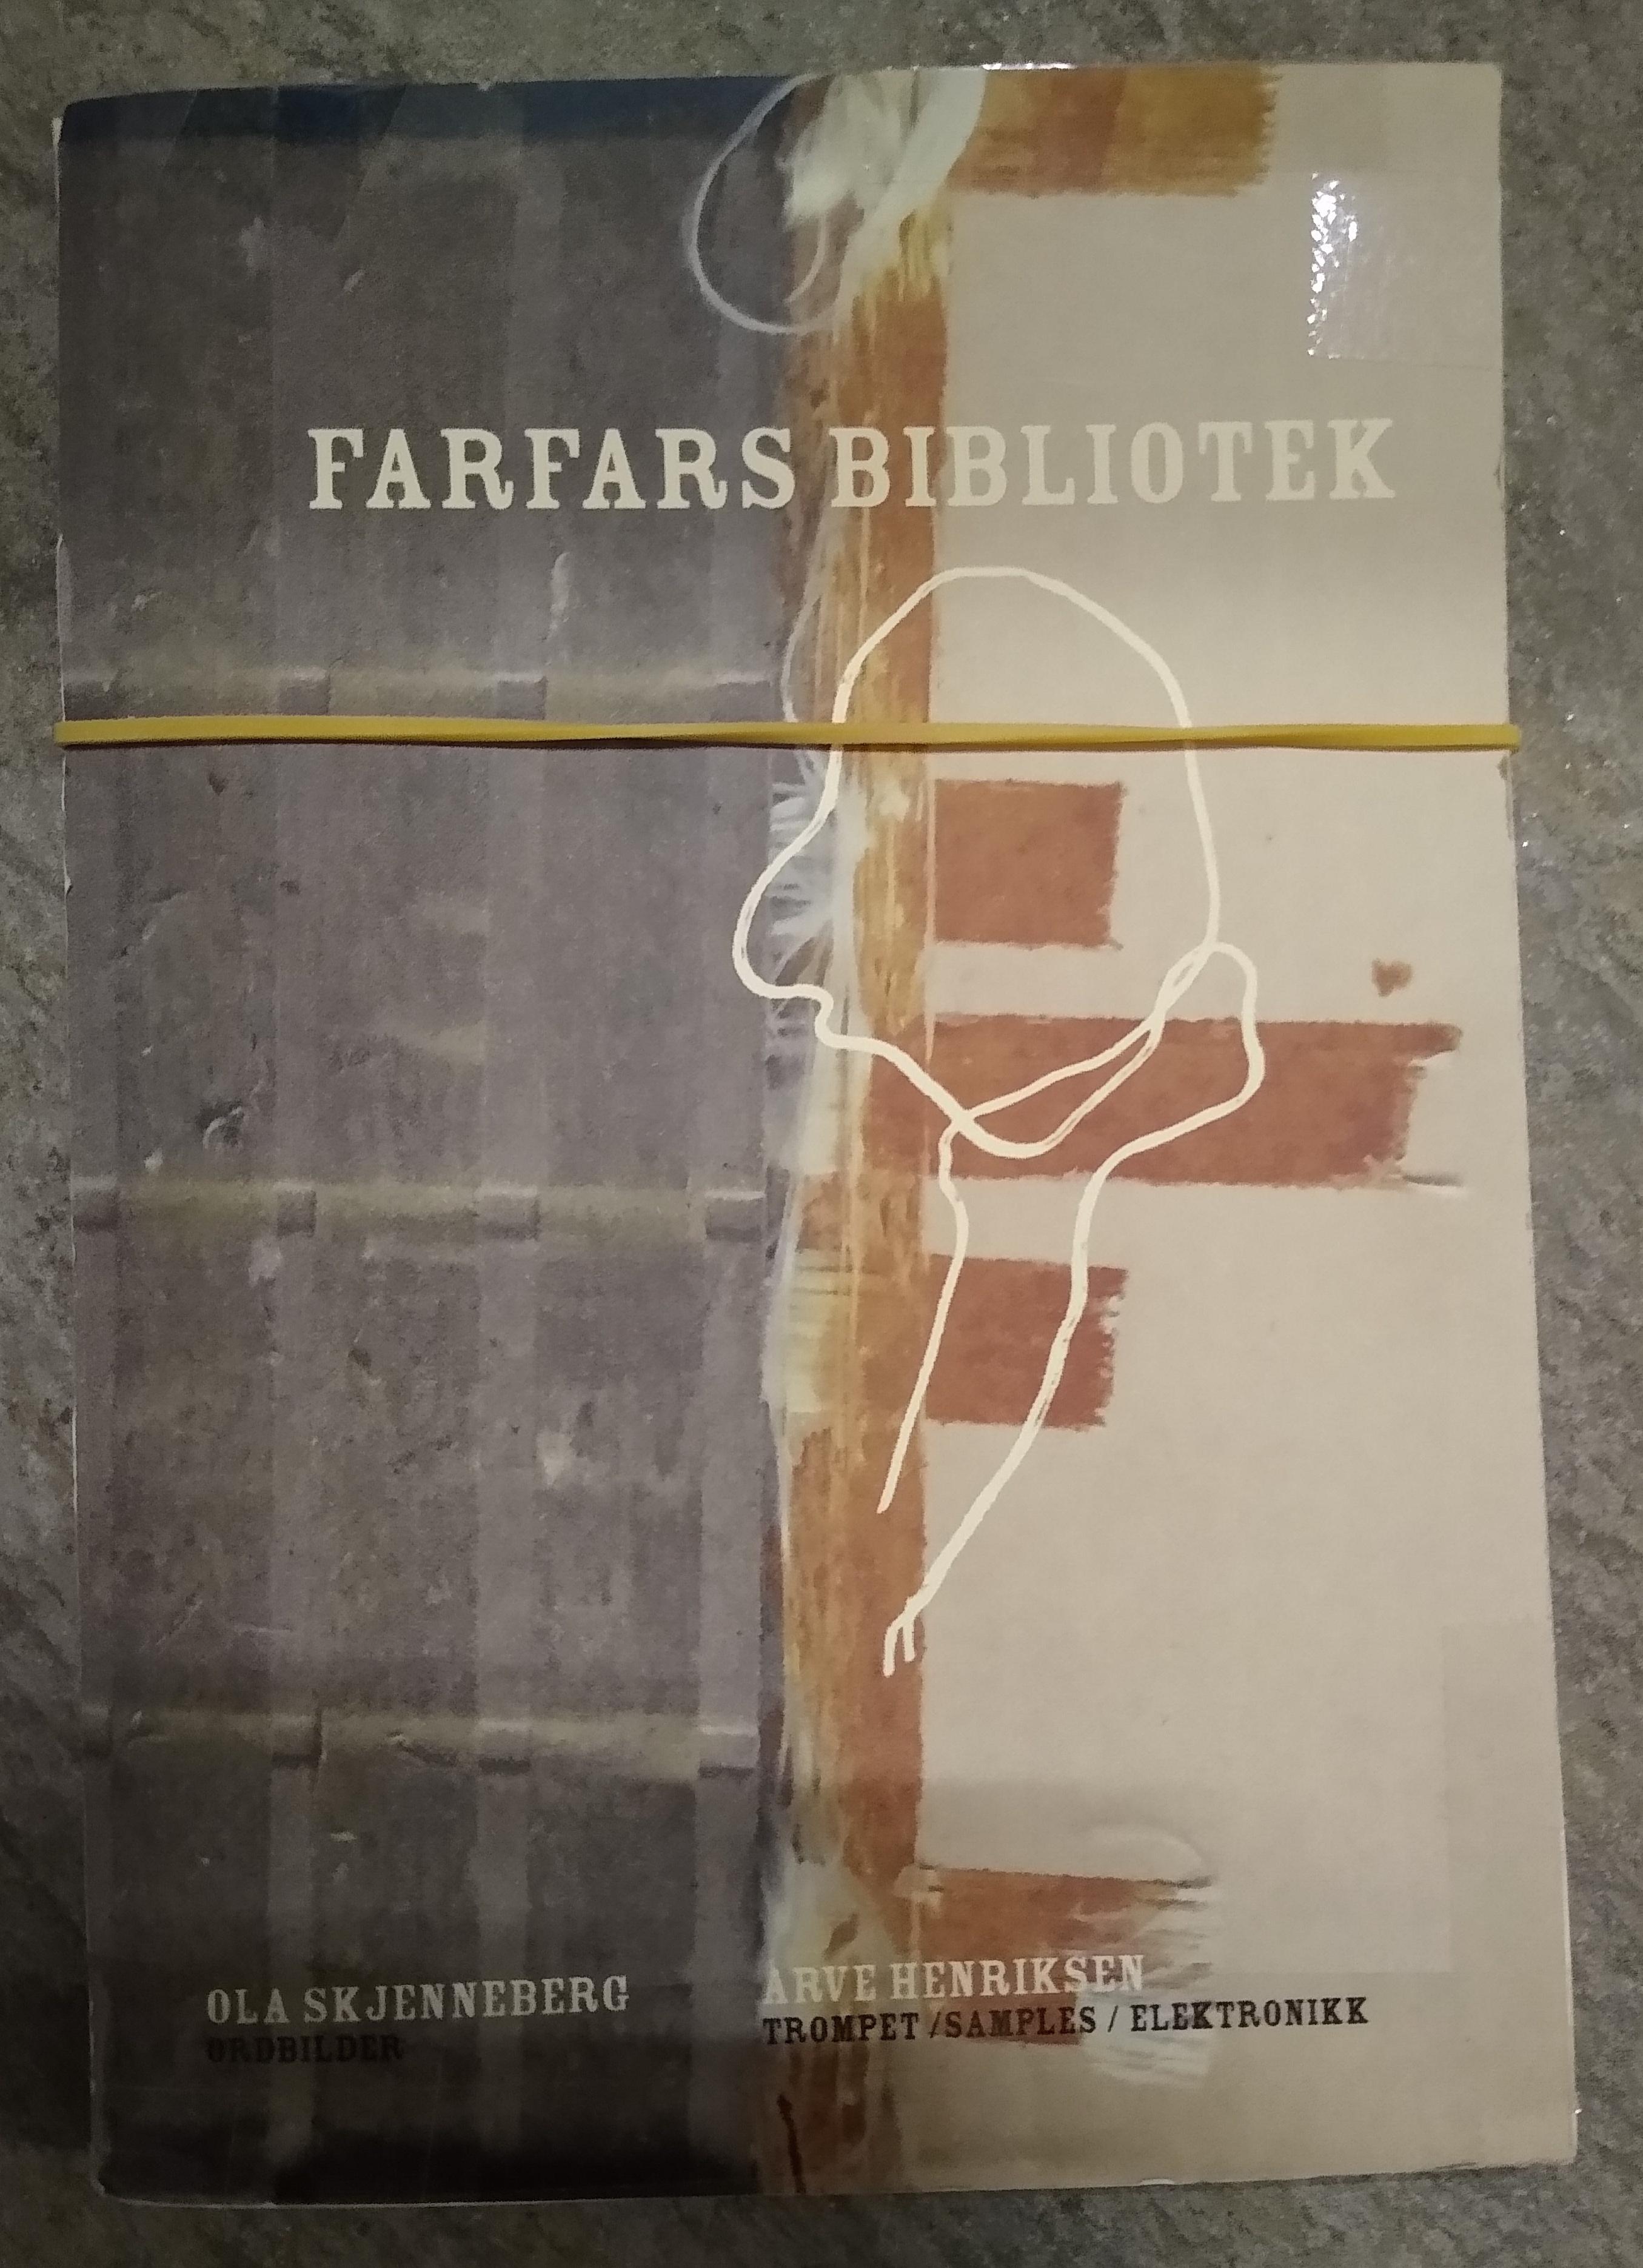 Farfars Bibliotek cover